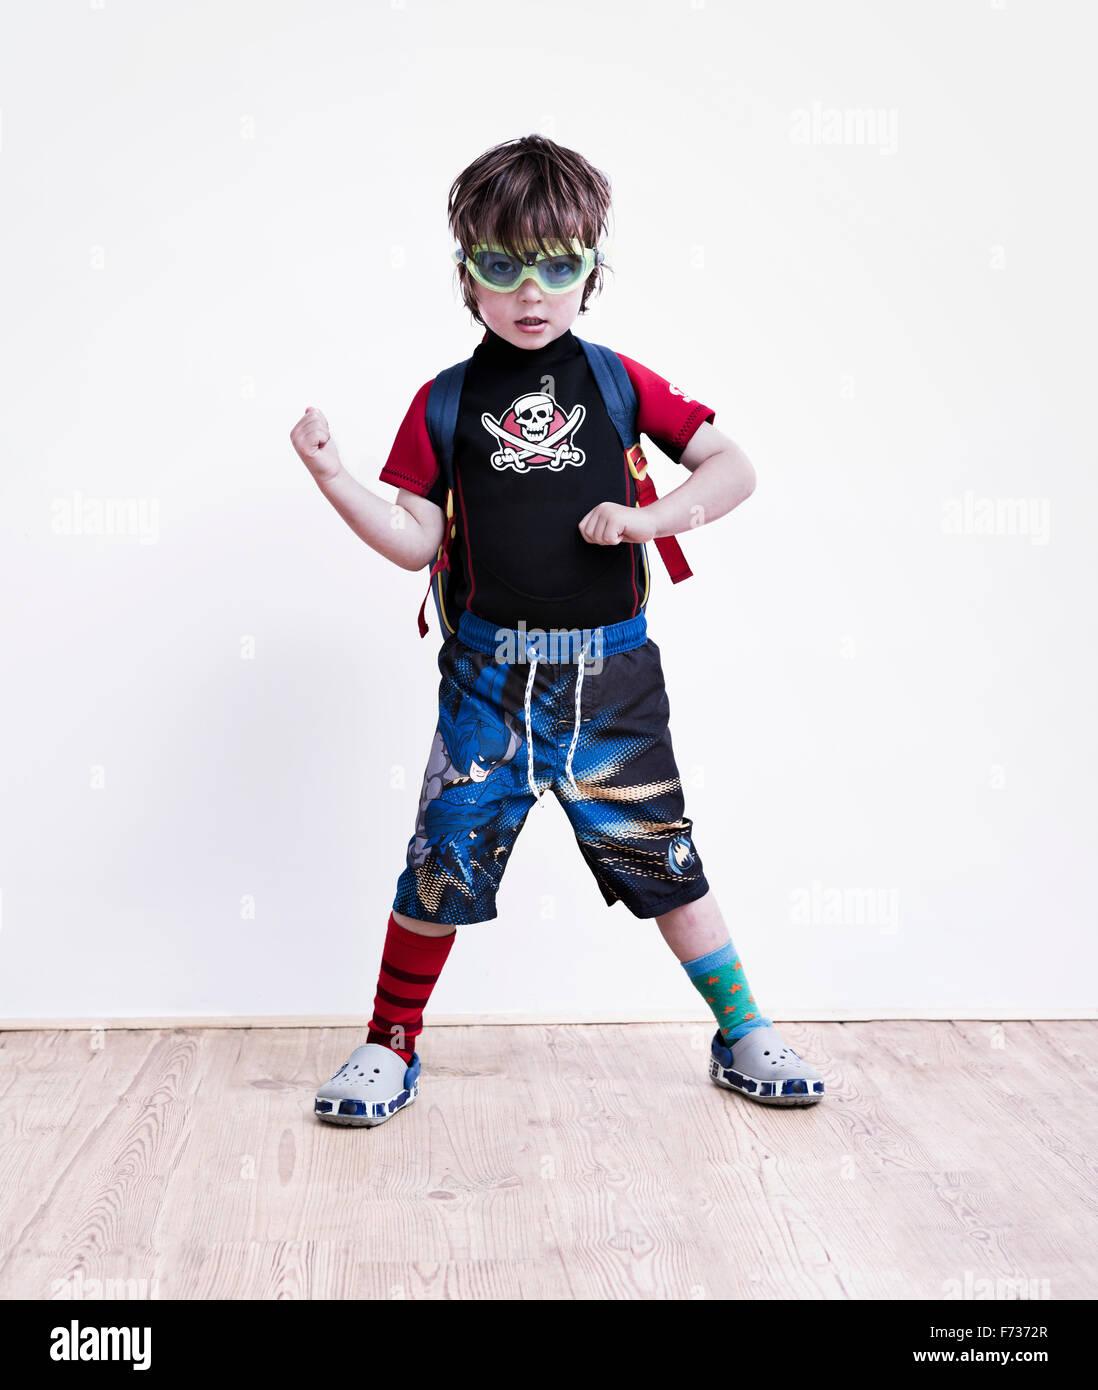 Un garçon debout les jambes écartées posing in fancy dress, vêtu d'un tee-shirt pirate, Photo Stock